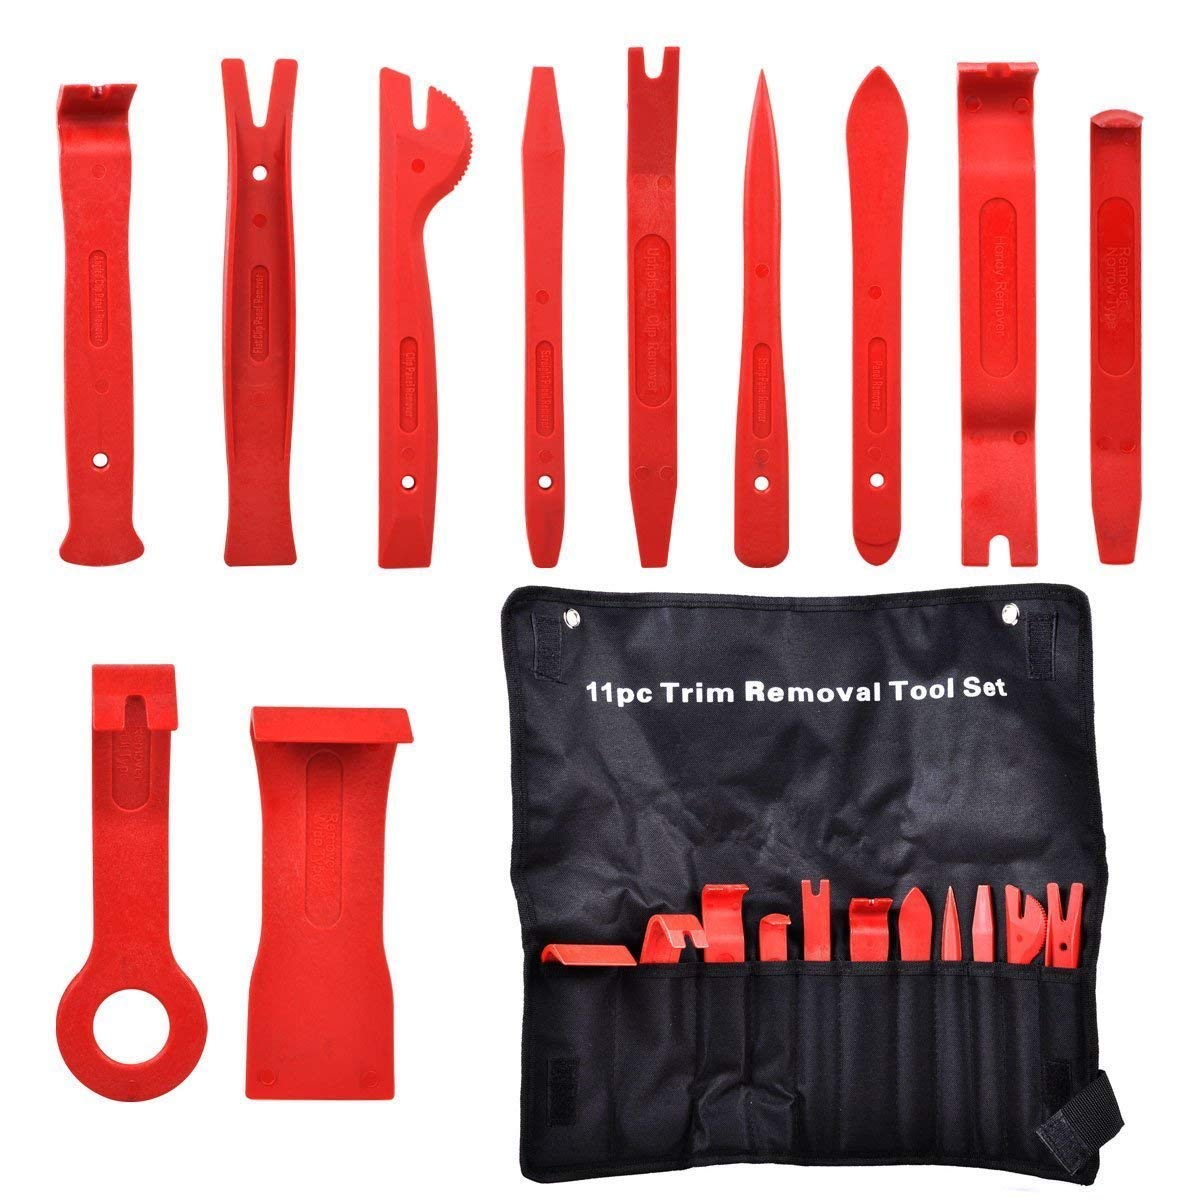 Eidoct 11 Pcs Premium Auto Trim Door Panel Window Molding Upholstery Clip Removal Tool Kit